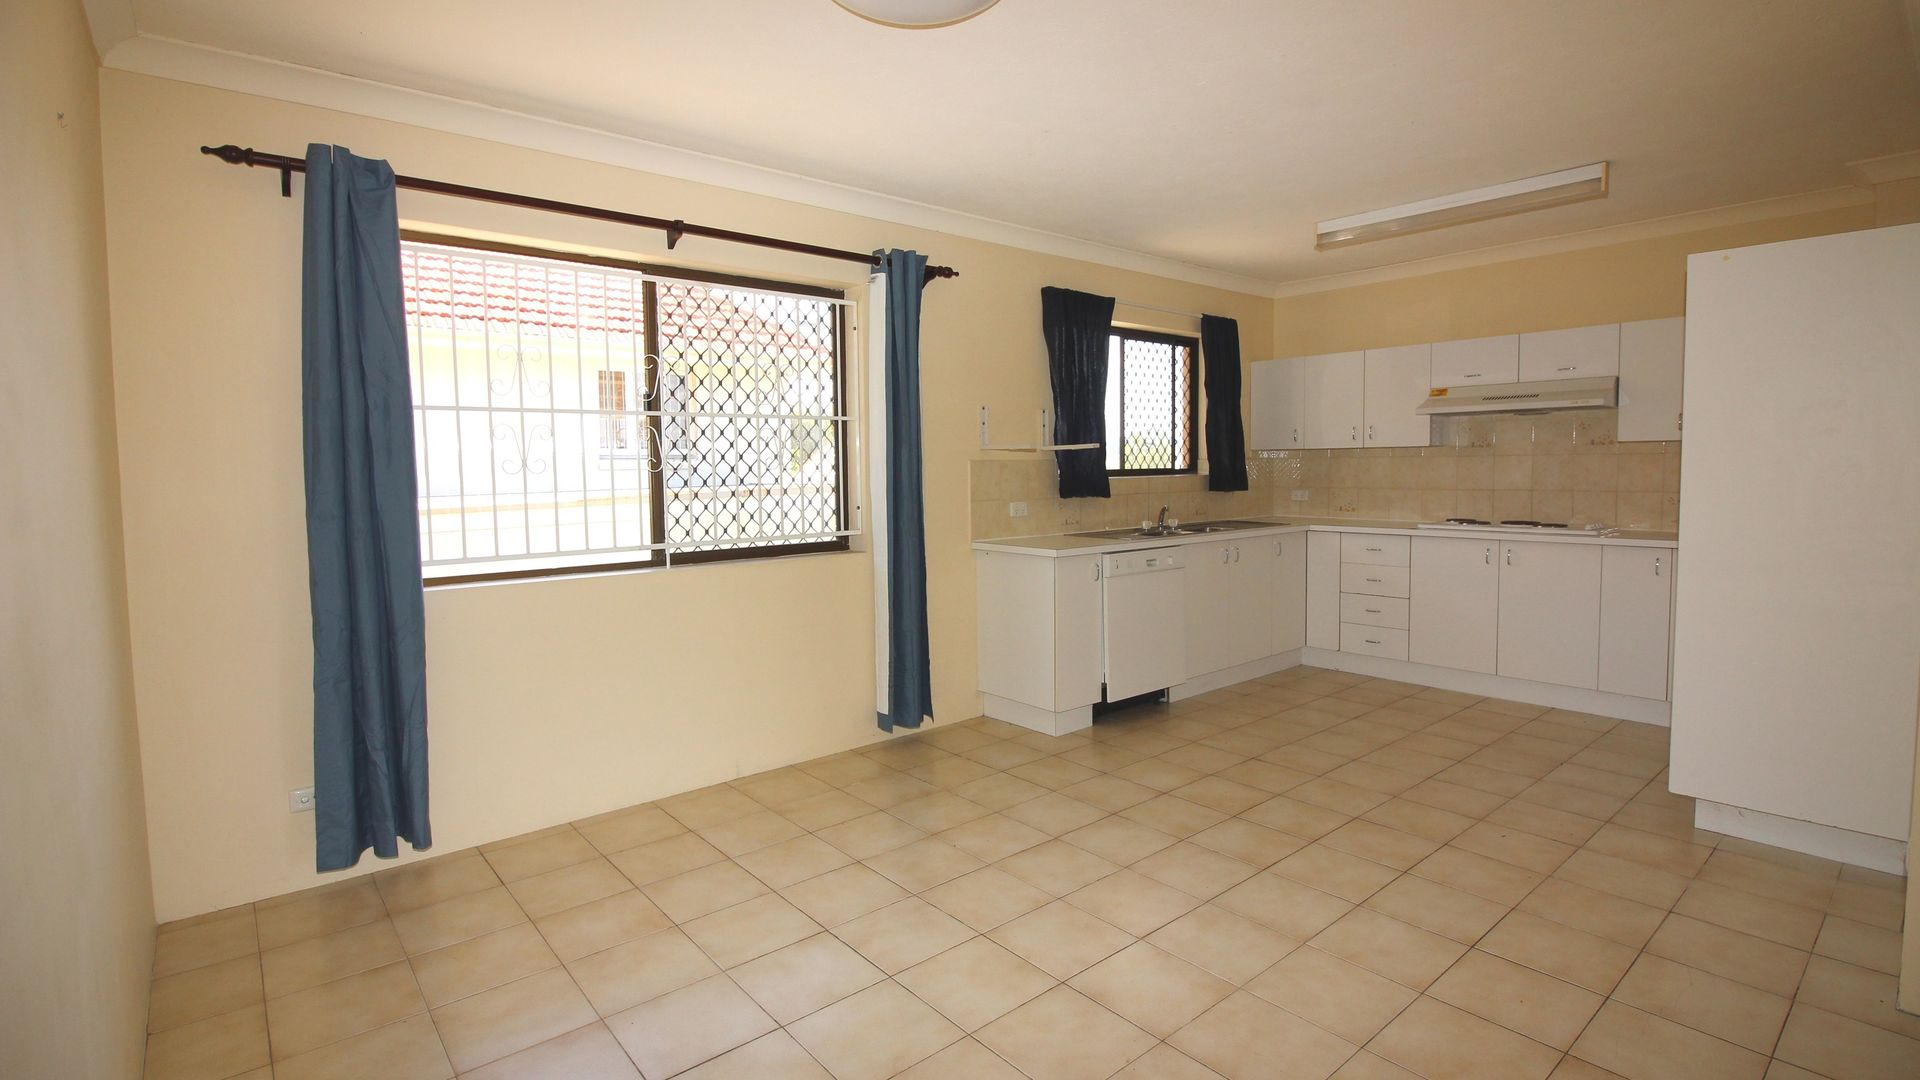 1A/39 Hunter Street, Wooloowin QLD 4030, Image 2